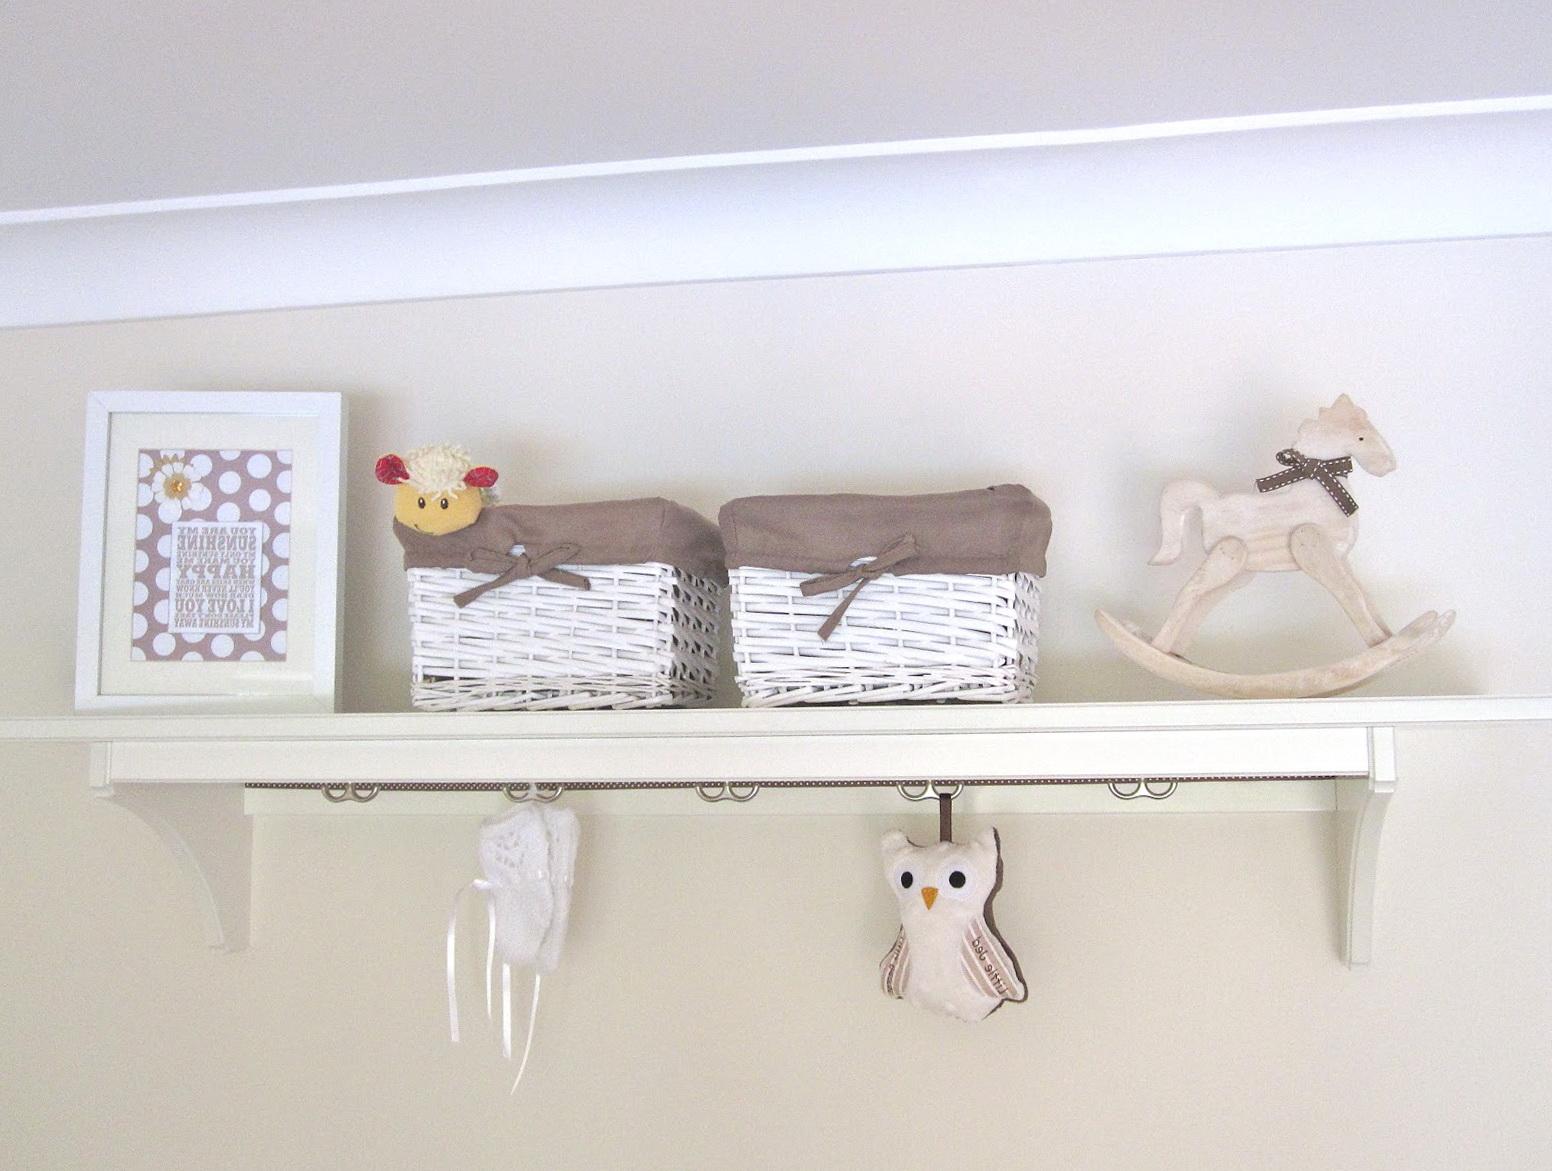 Nursery Wall Shelves For Books